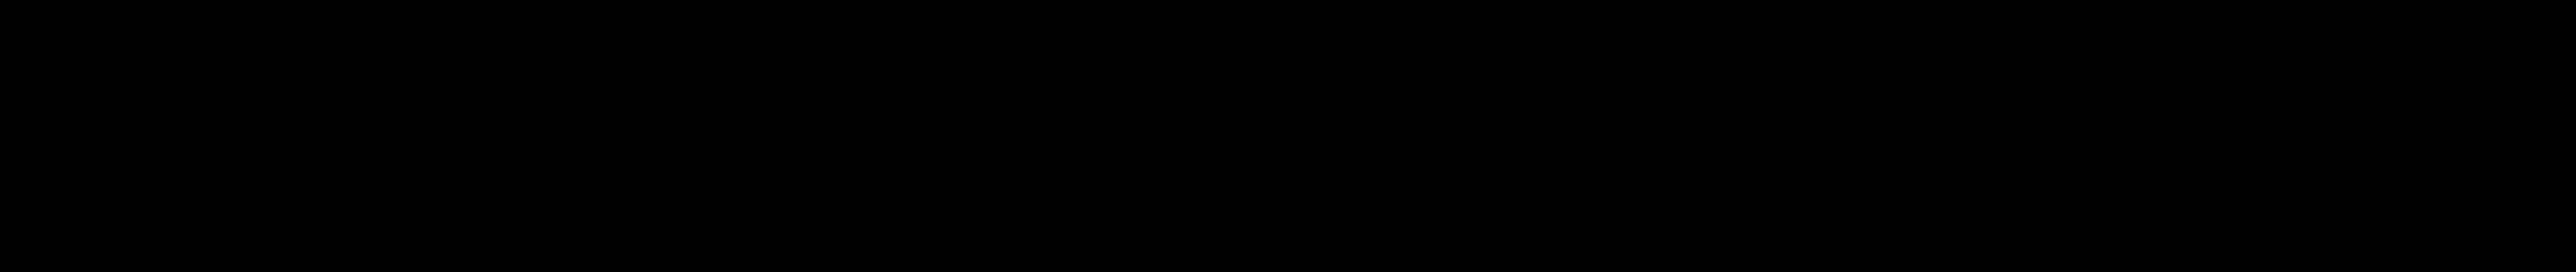 Logo Nybrokajen - @nybrokajen - nybrokajen.com